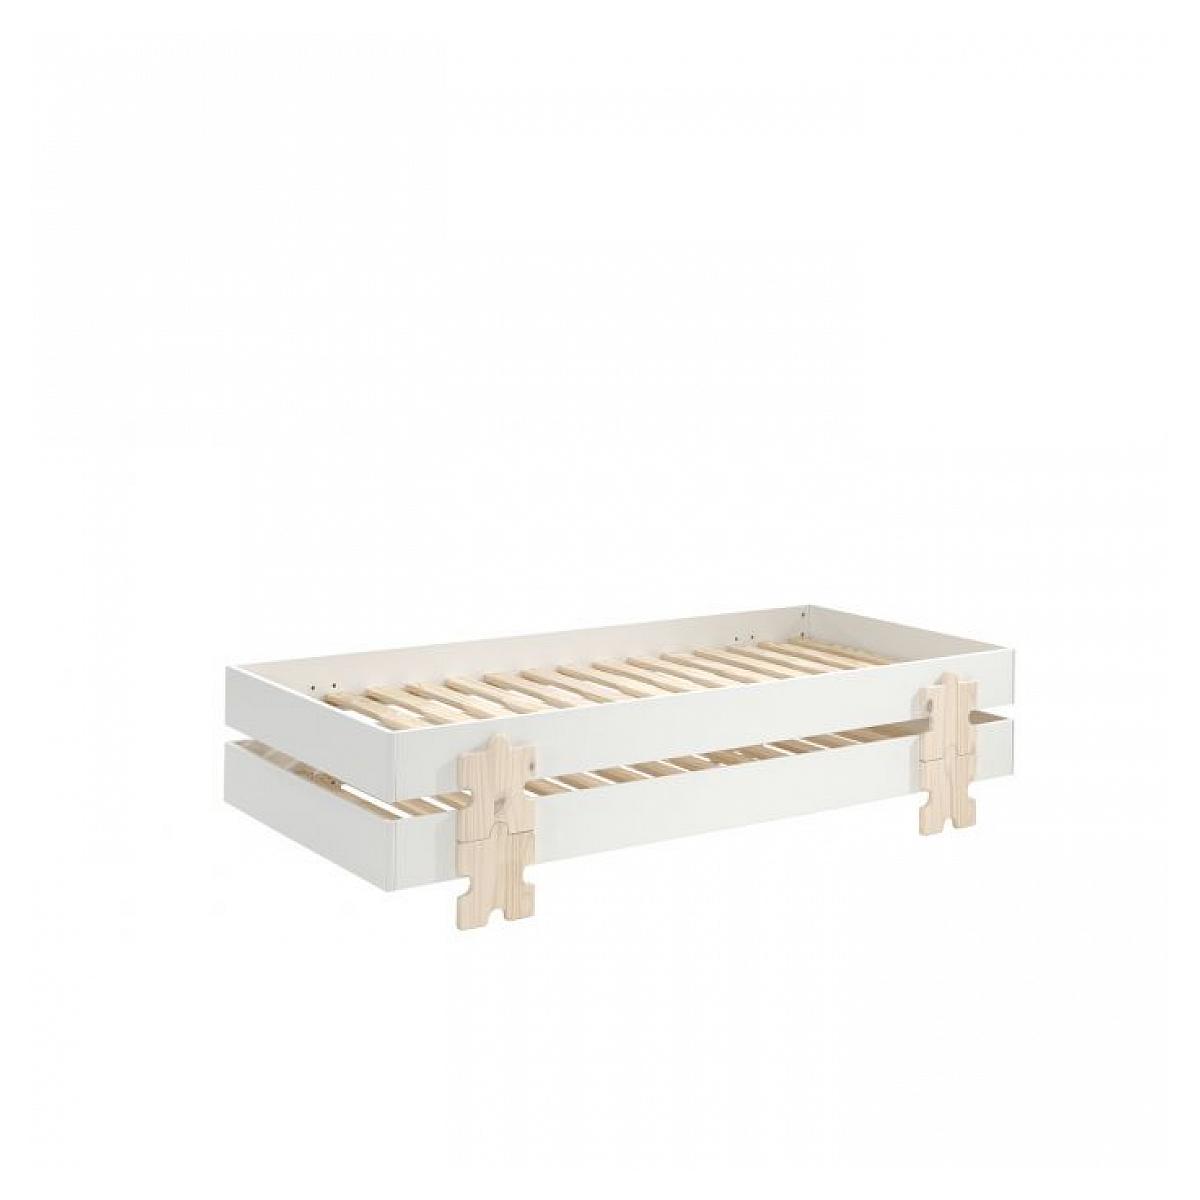 Vipack - 2 Lits Modulo Puzzle Blanc Empilables 90x200 L 203,6 x Lg 93,8 x